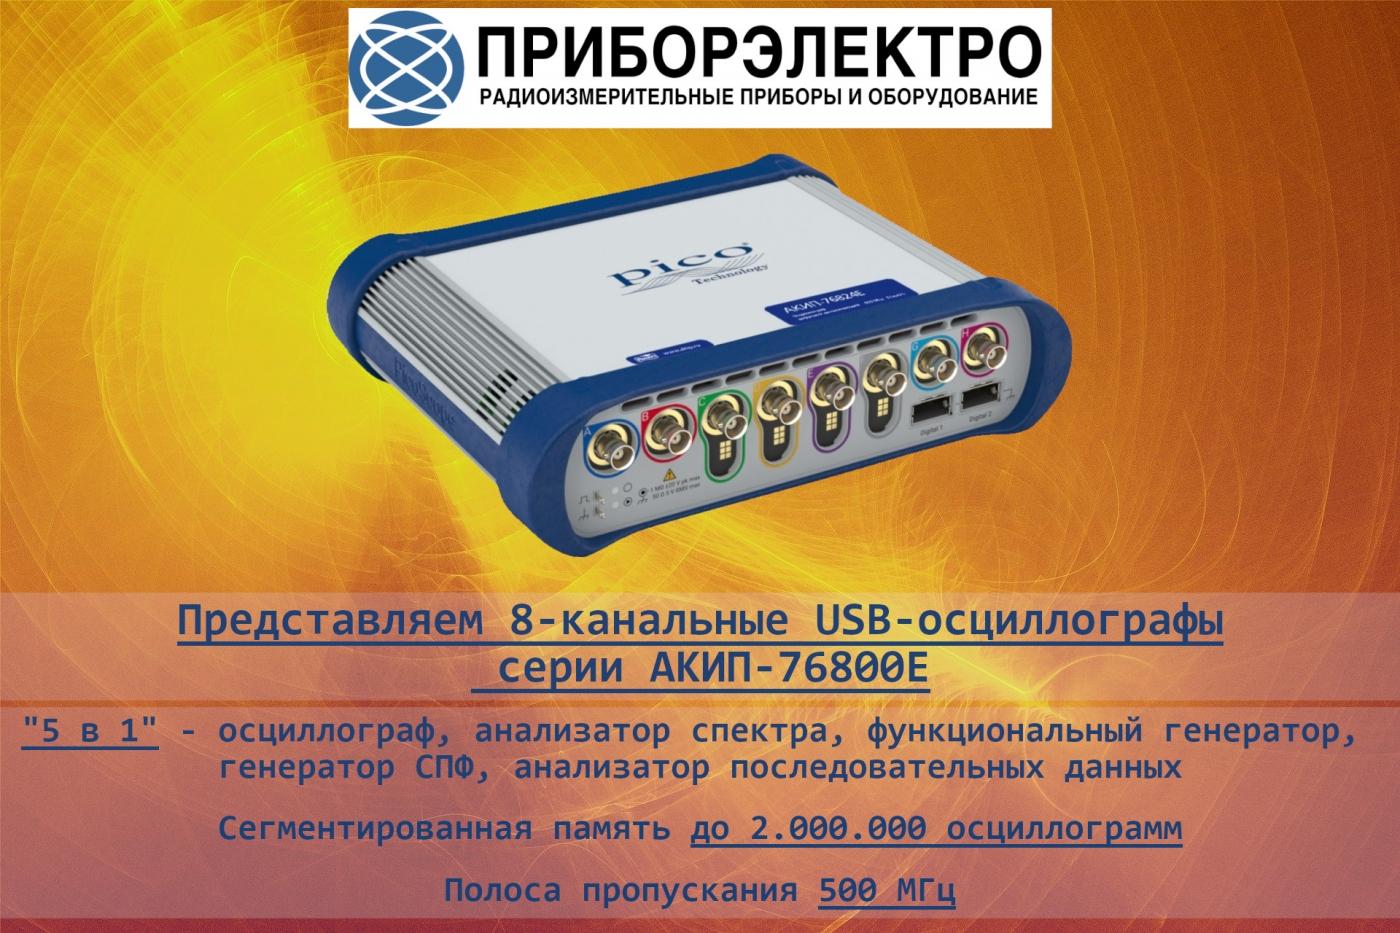 USB-осциллографы серии АКИП-76800E